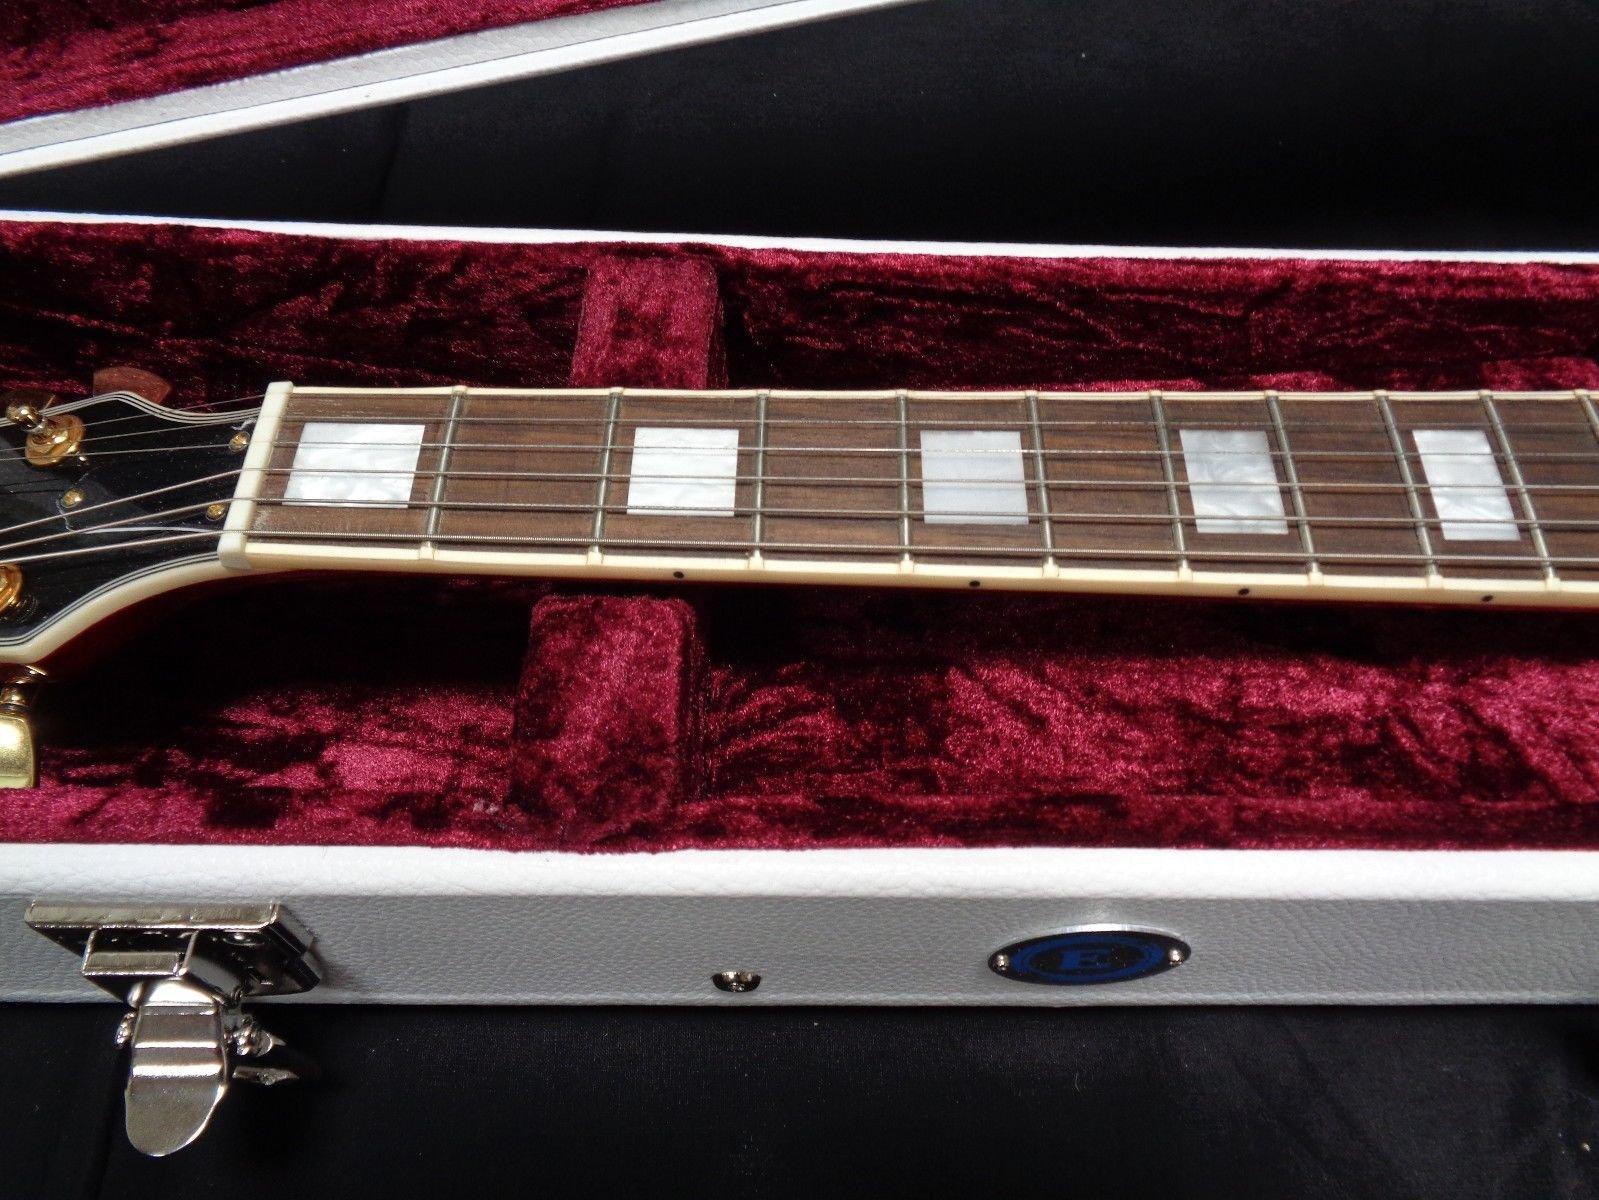 Allen Eden White Hard Shell Electric Guitar Case for Arch Top Les Paul by Allen Eden (Image #9)